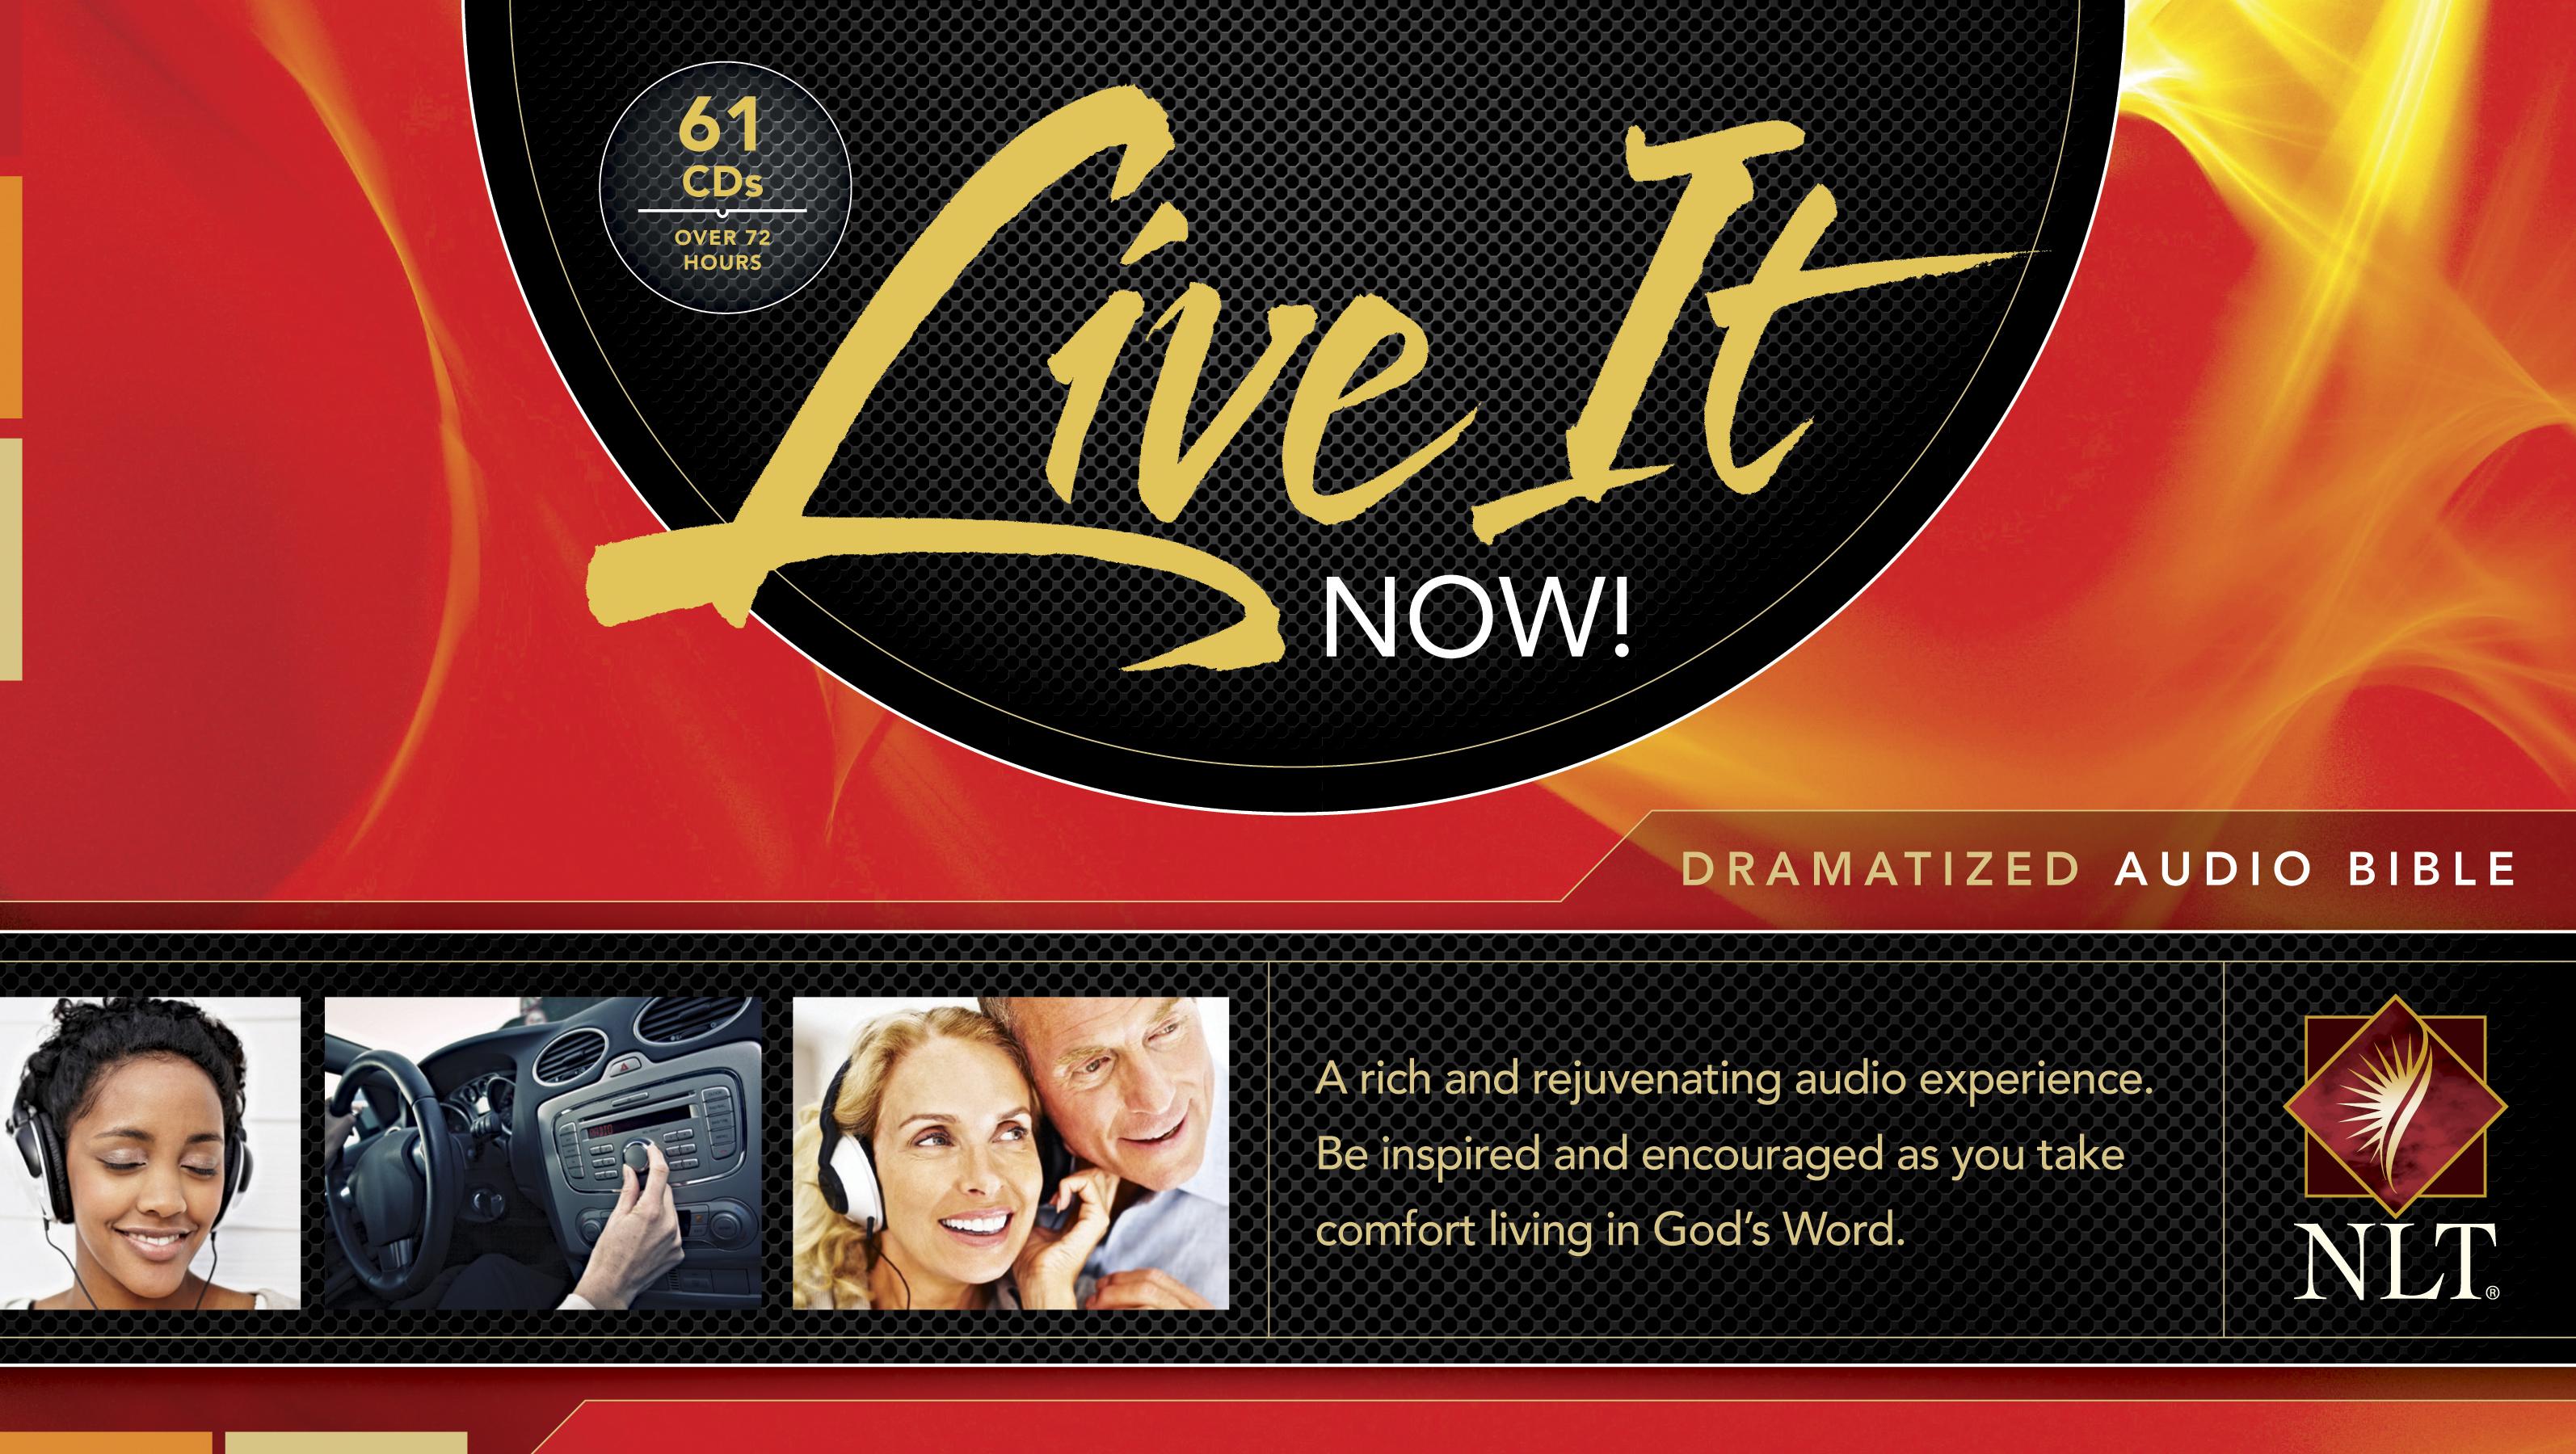 Live It Now! Dramatized Audio Bible